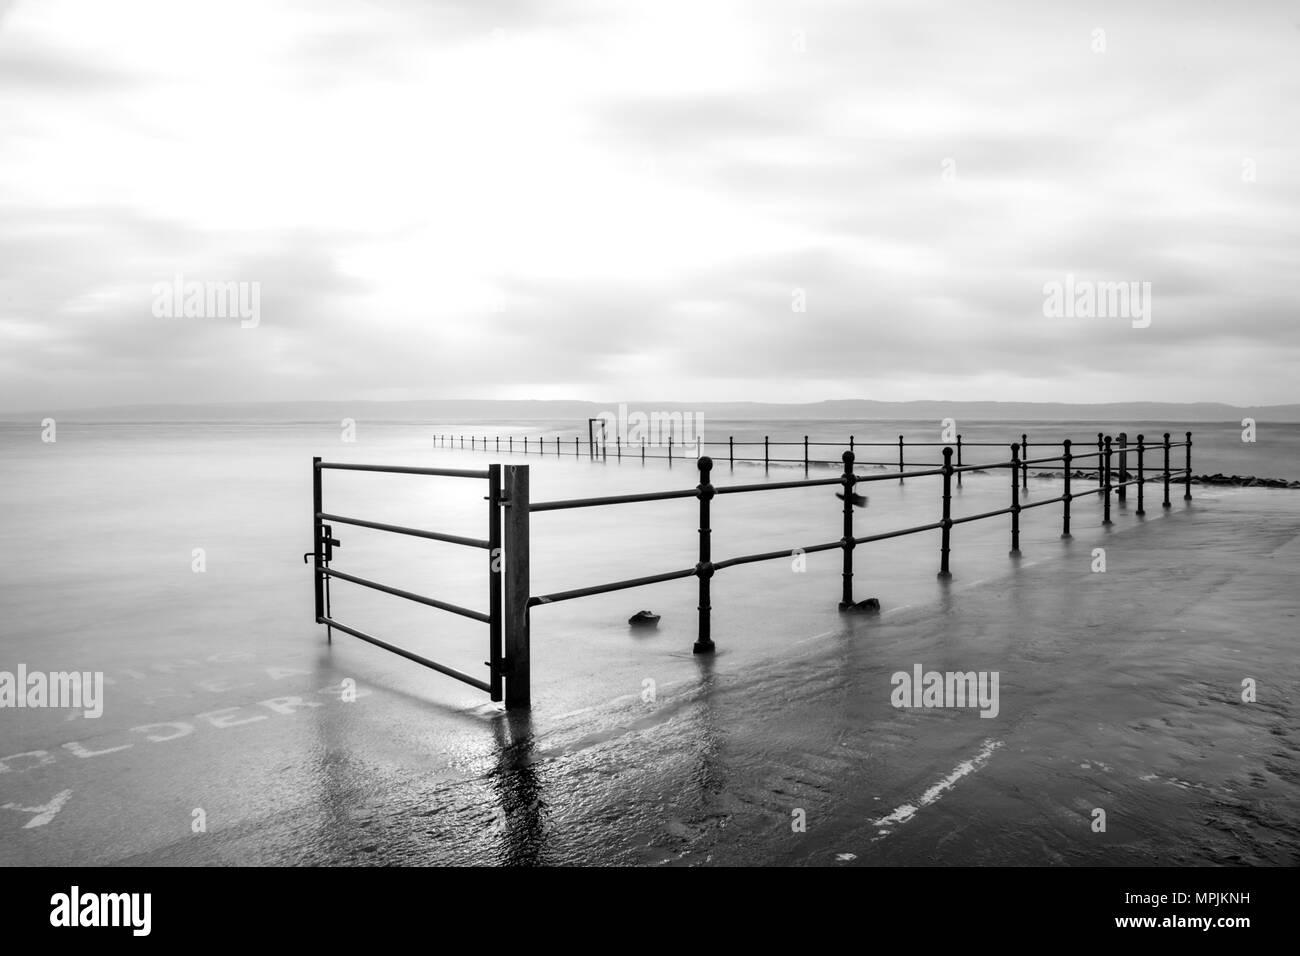 Marine lake wall with railings. Long exposure stormy sea. - Stock Image